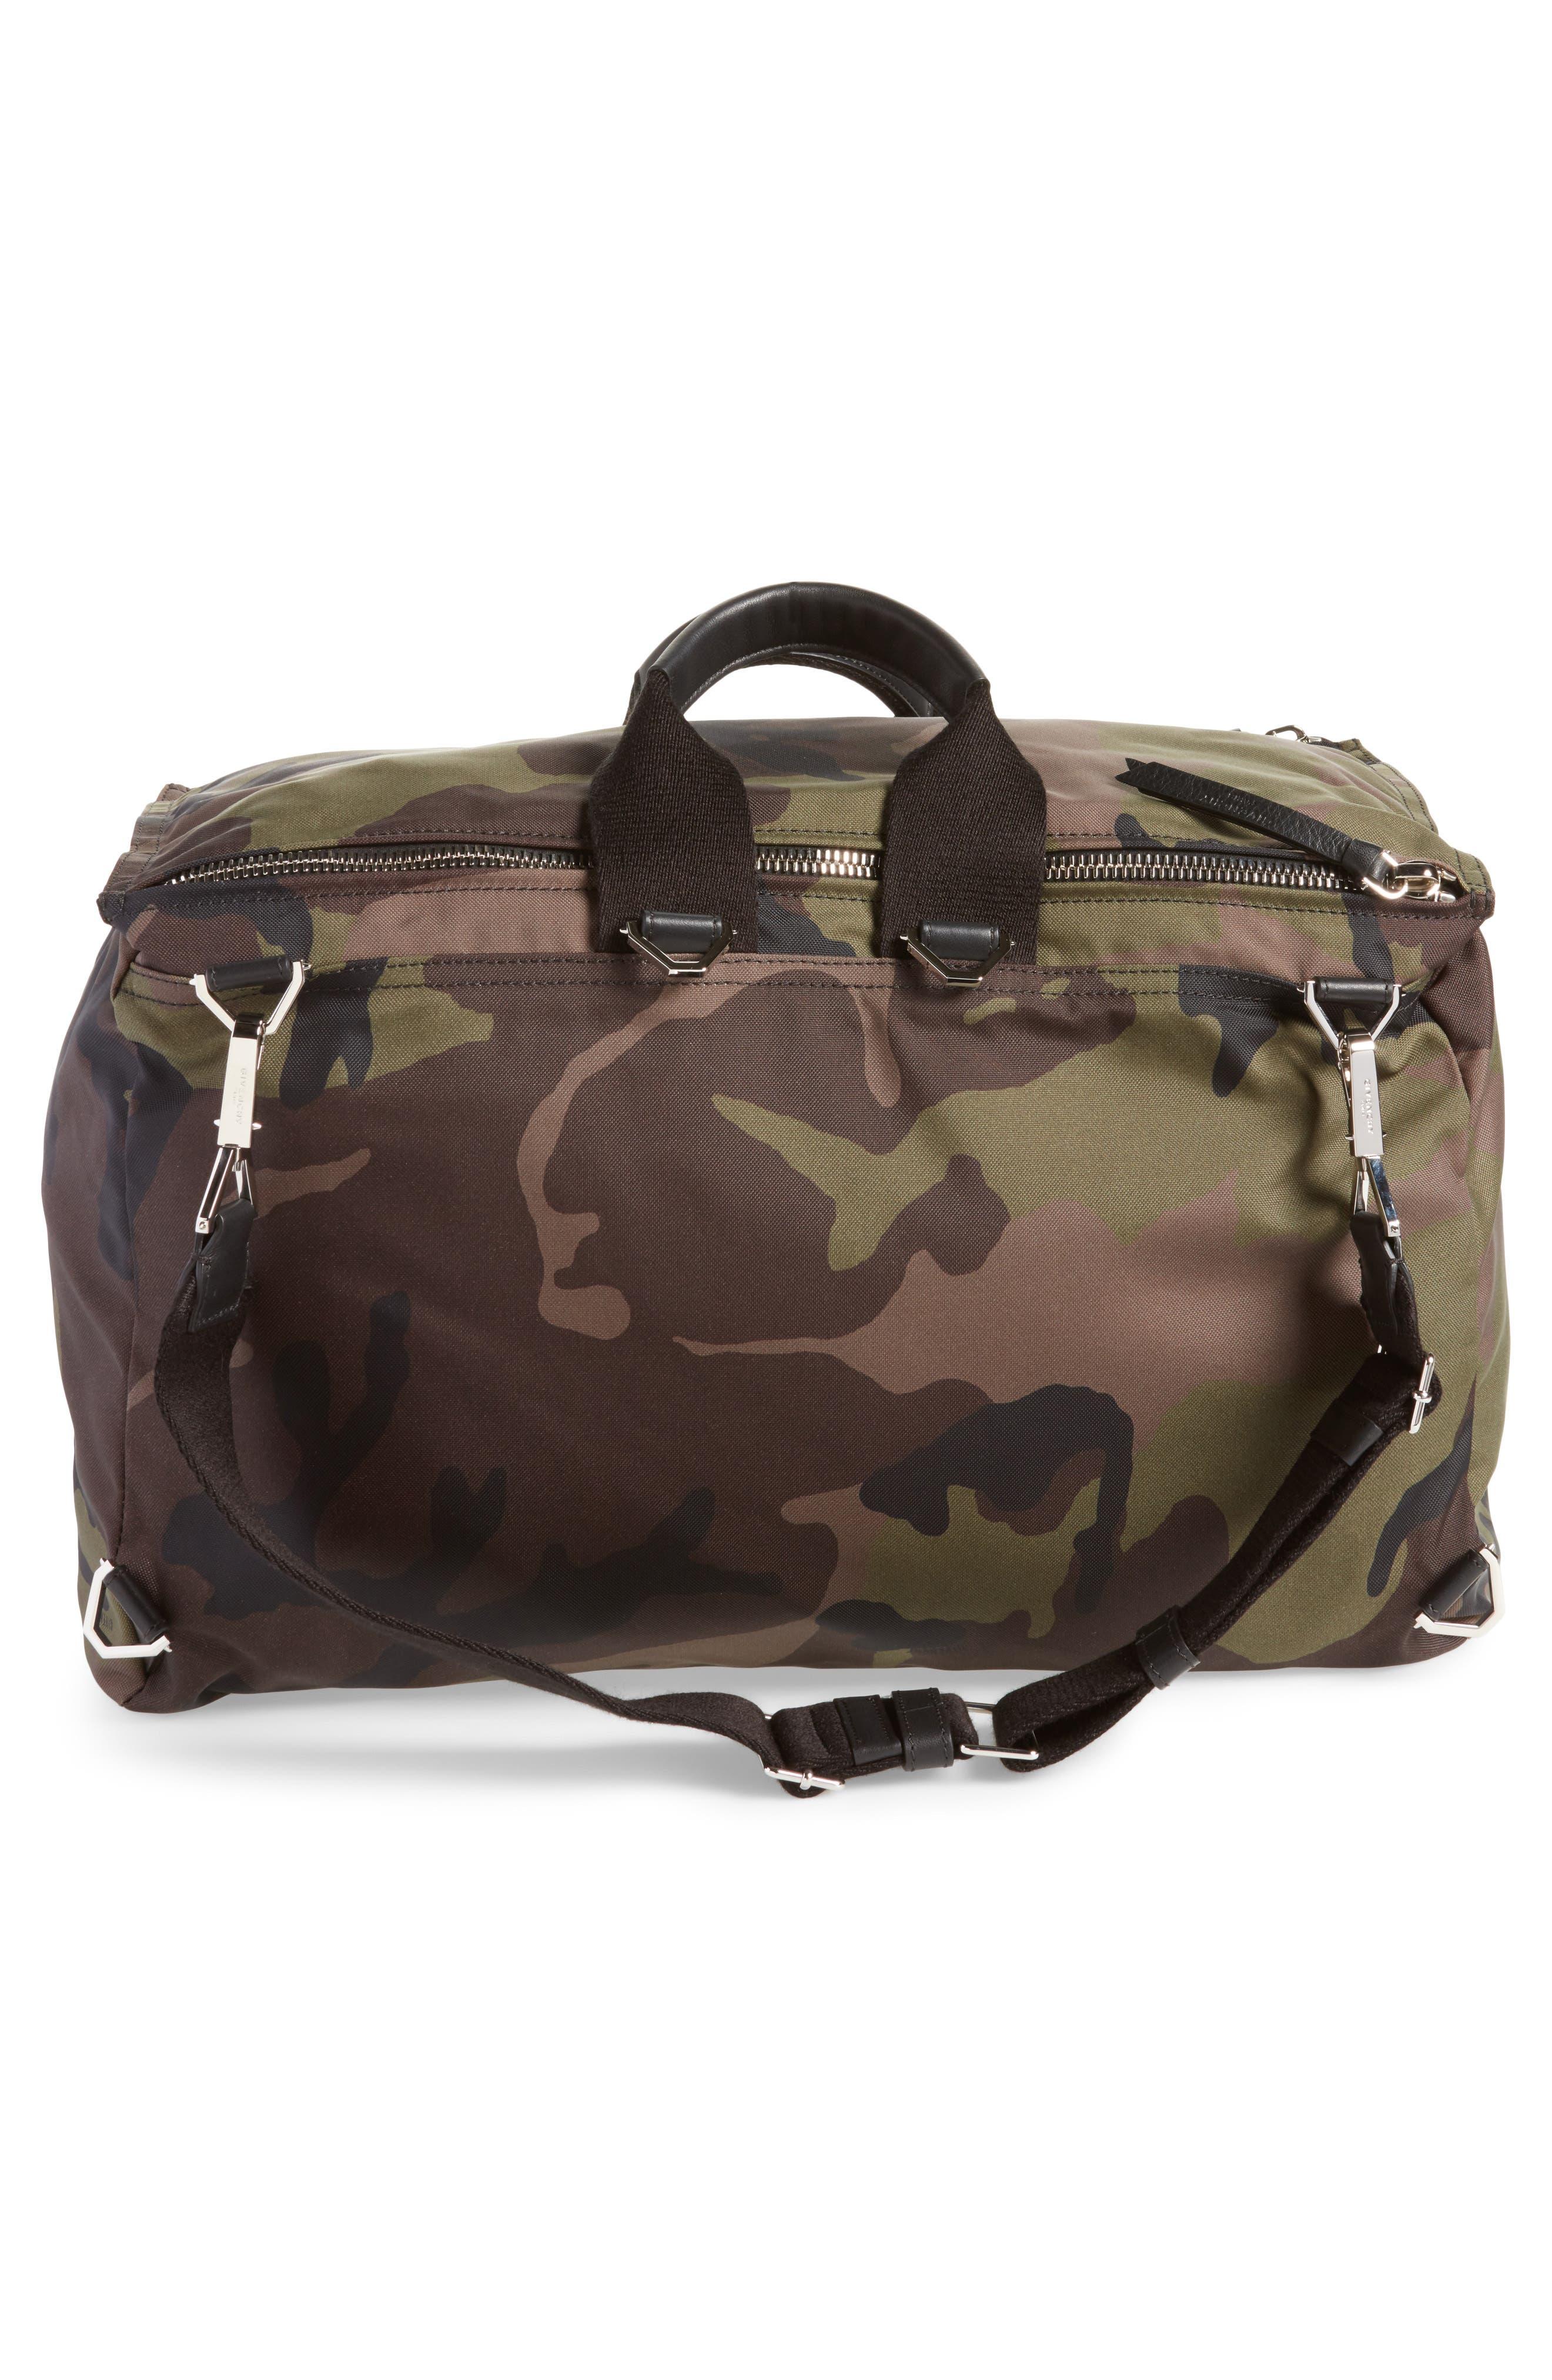 Pandora Camo Convertible Backpack,                             Alternate thumbnail 3, color,                             Multicolored